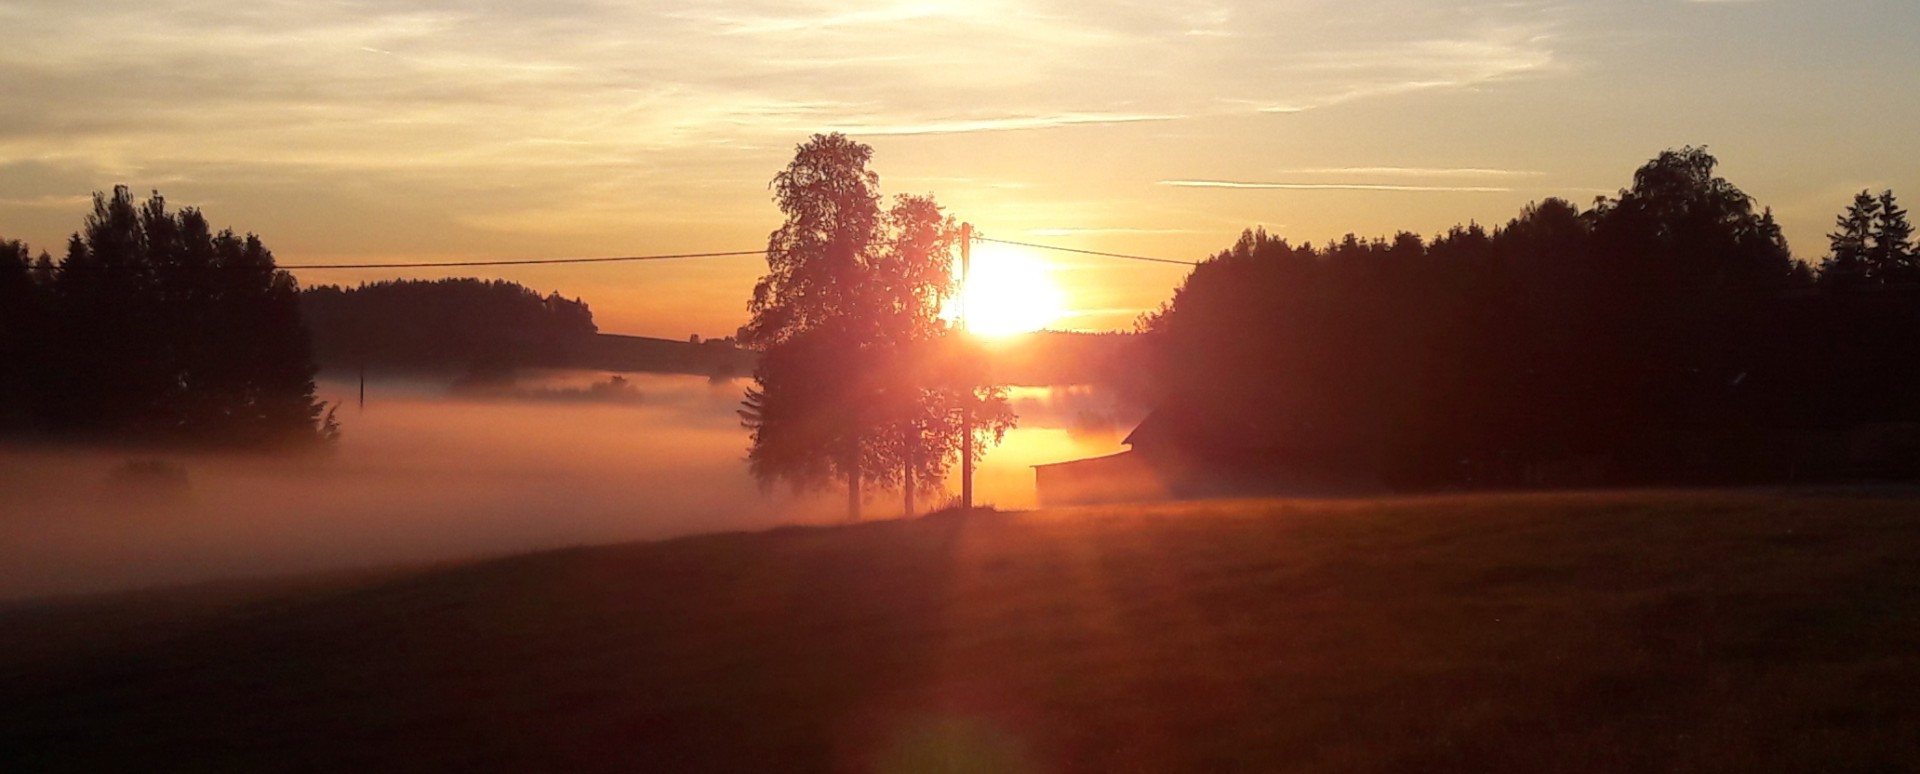 Leuchtender Nebel  Sommersonnenaufgang